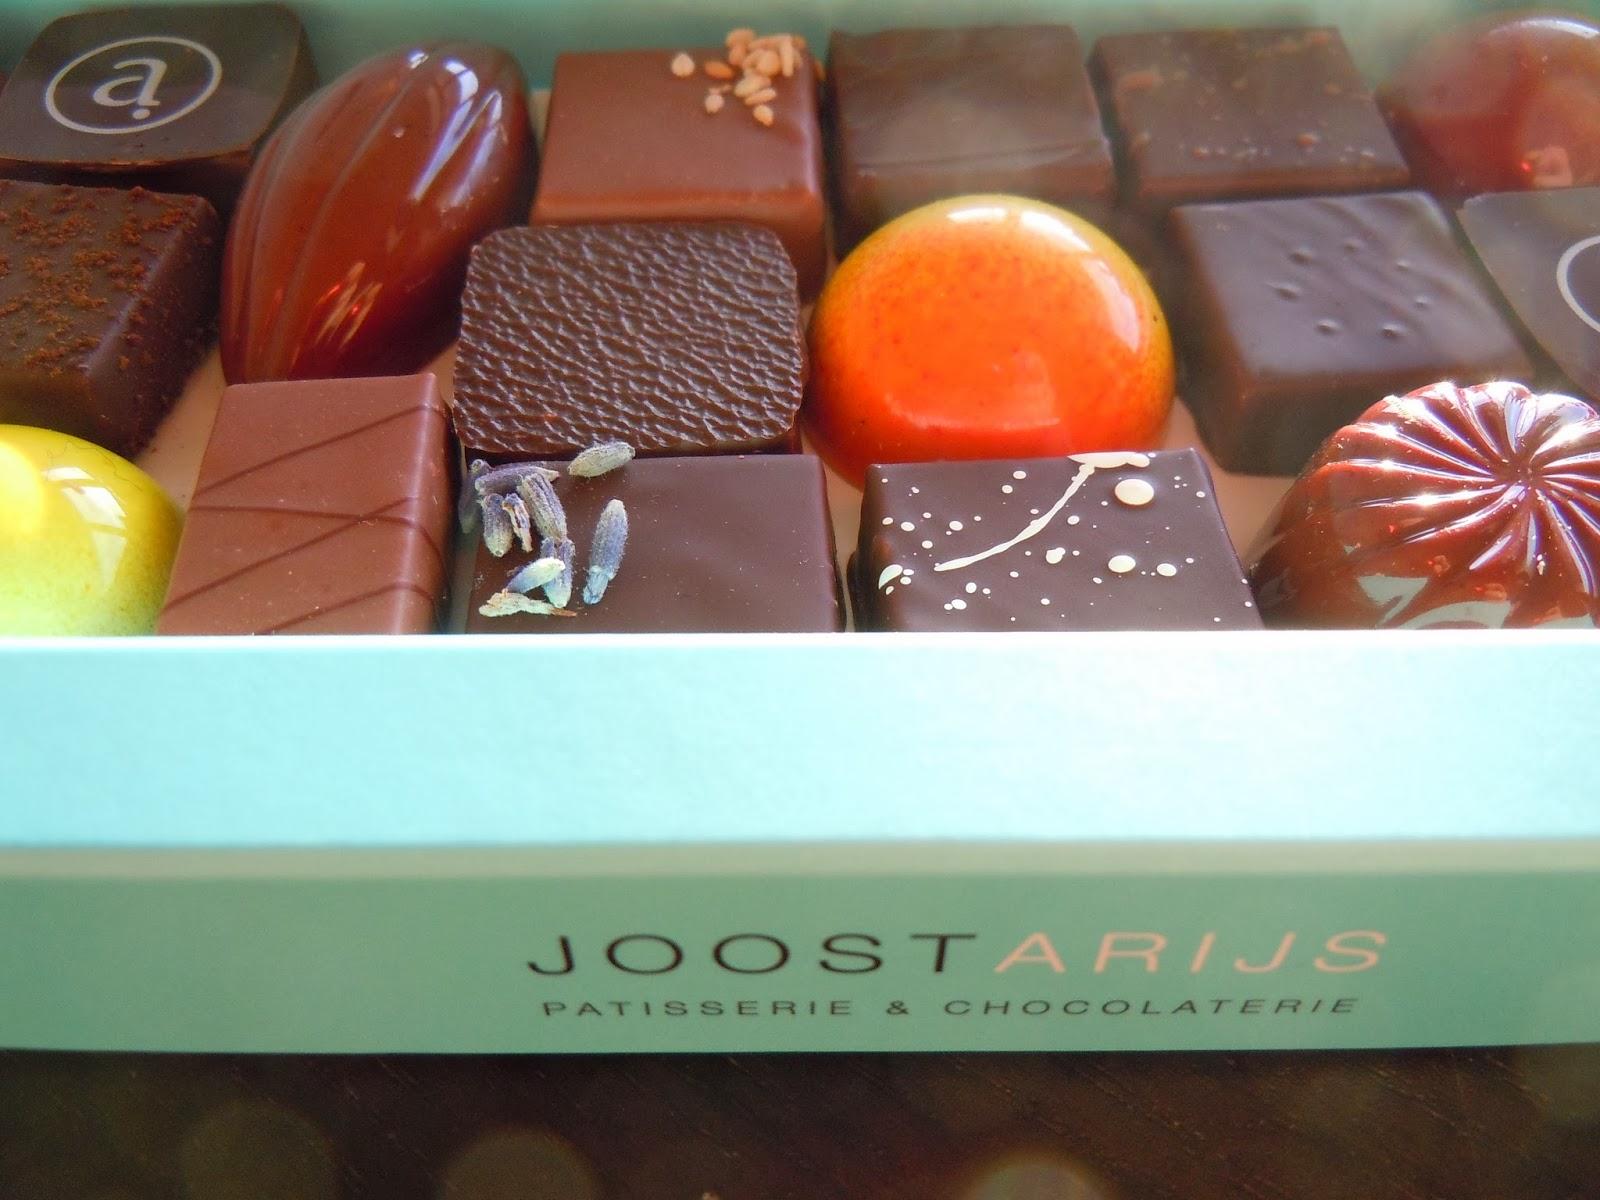 Chocolats Joost Arijs